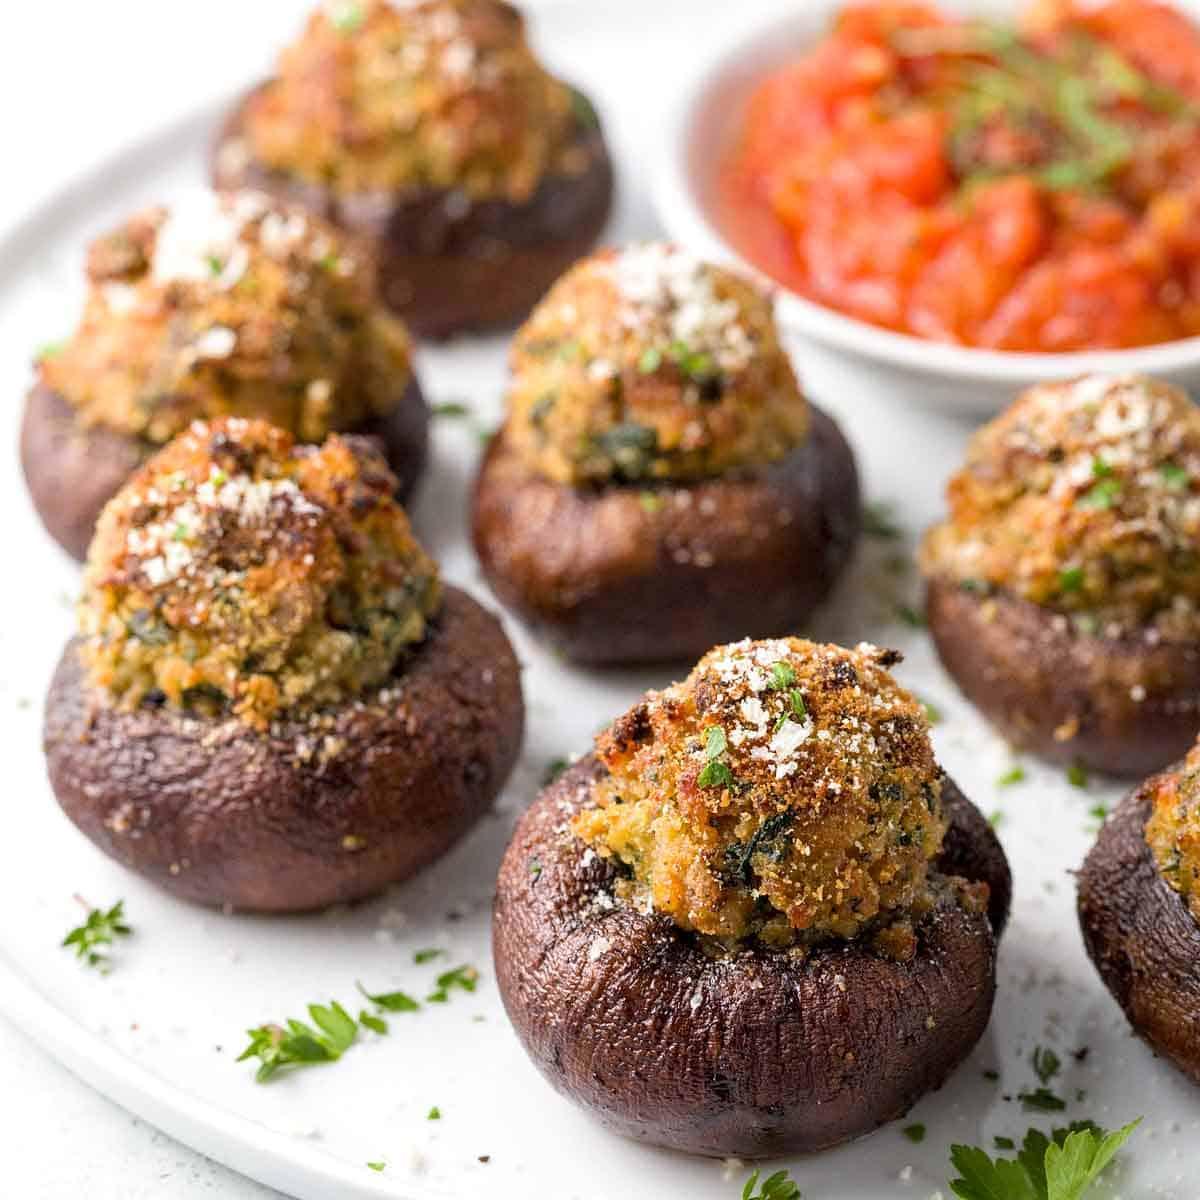 Stuffed Mushrooms Recipe with Italian Sausage | Jessica Gavin